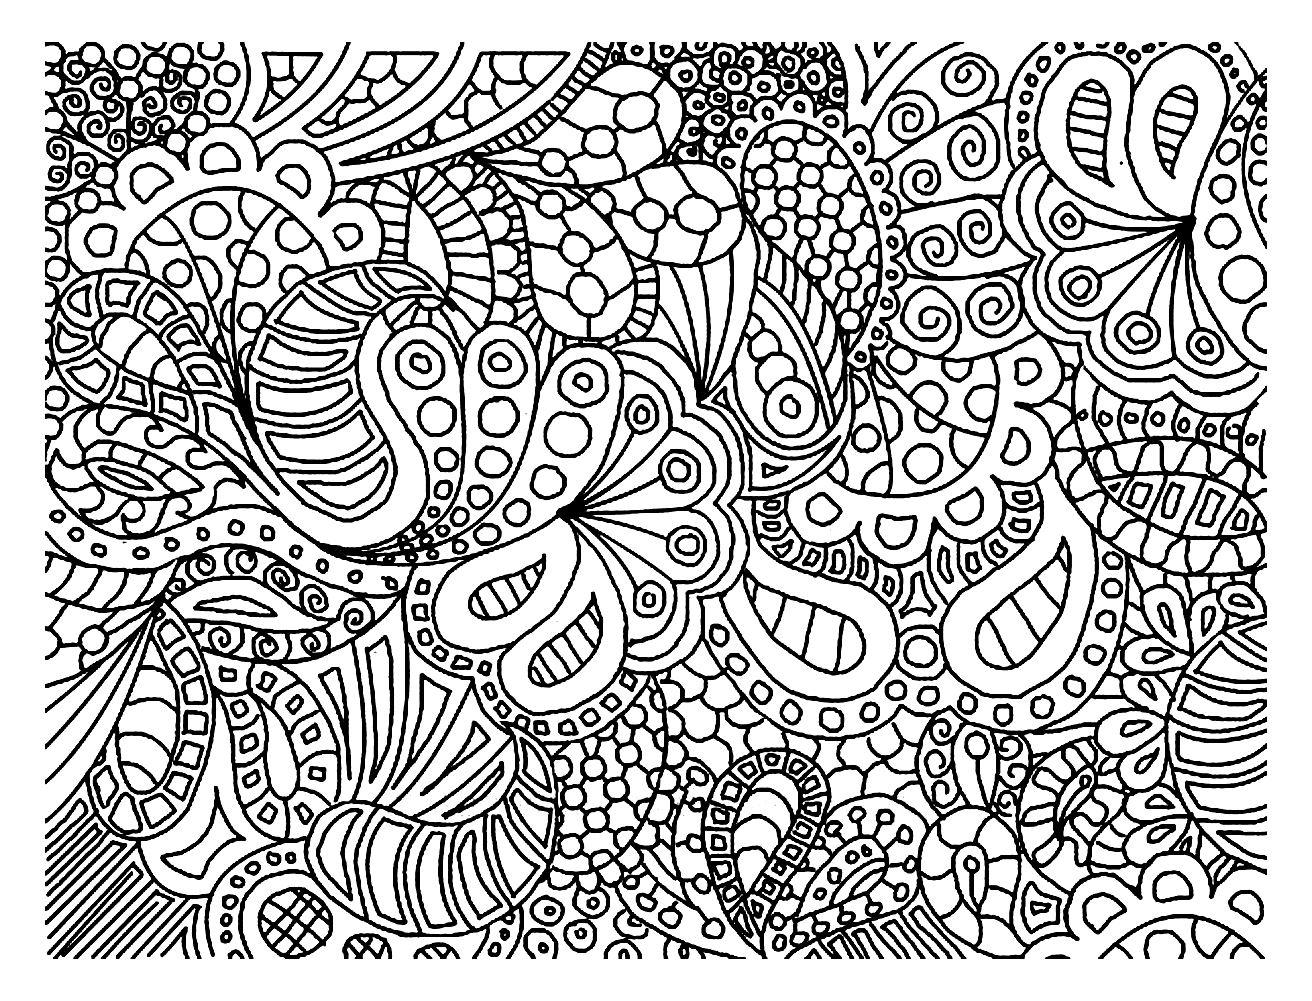 Doodle art to color for children - Doodle Art Kids Coloring Pages